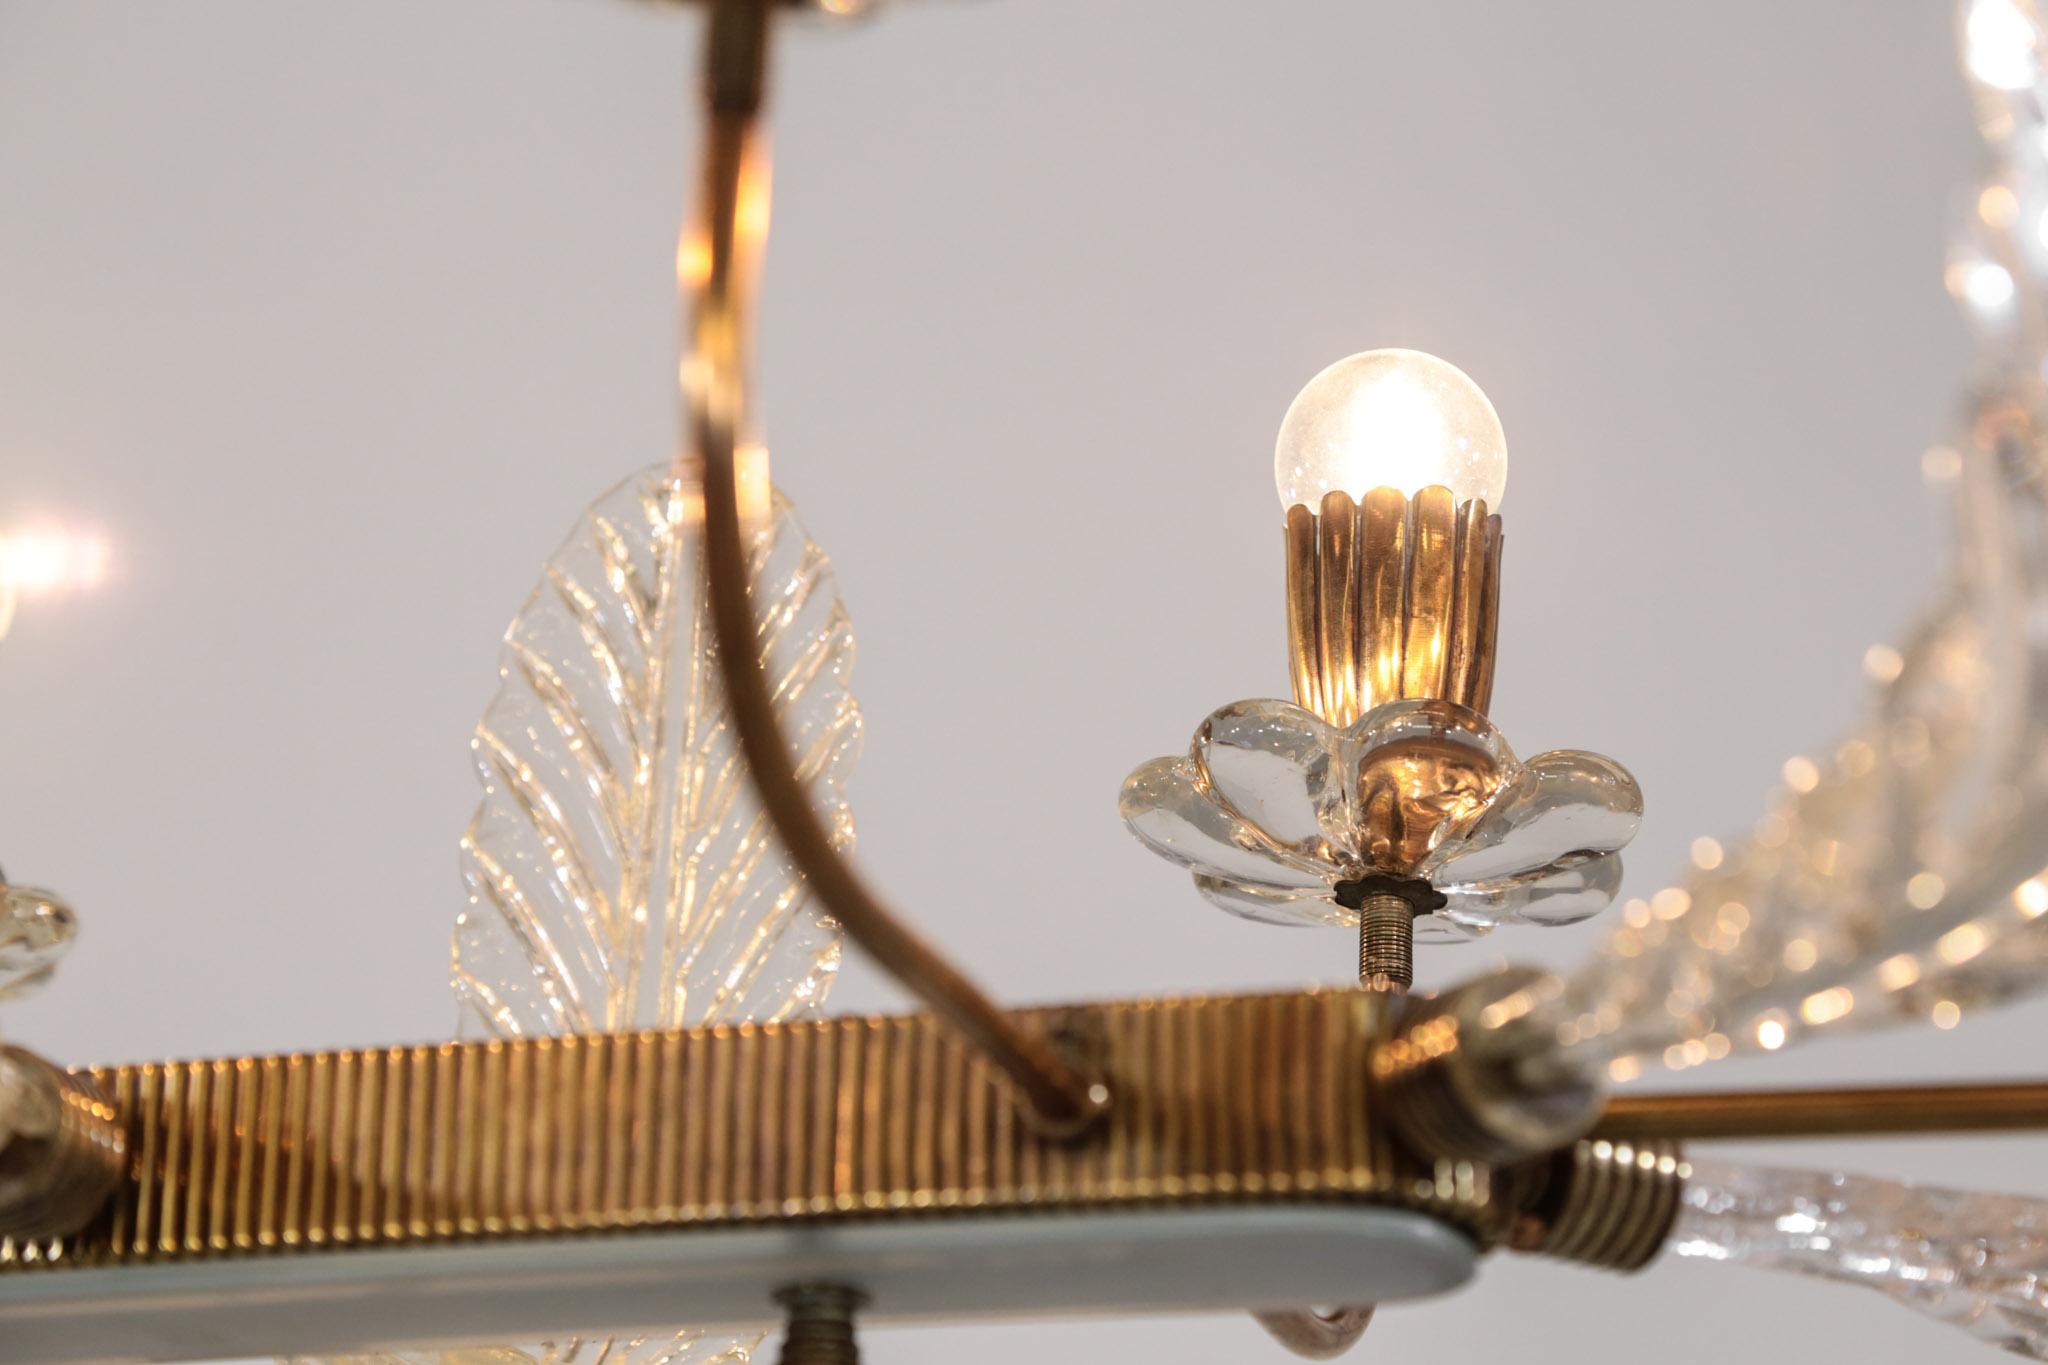 lustre barovier et toso verre de murano design italien. Black Bedroom Furniture Sets. Home Design Ideas